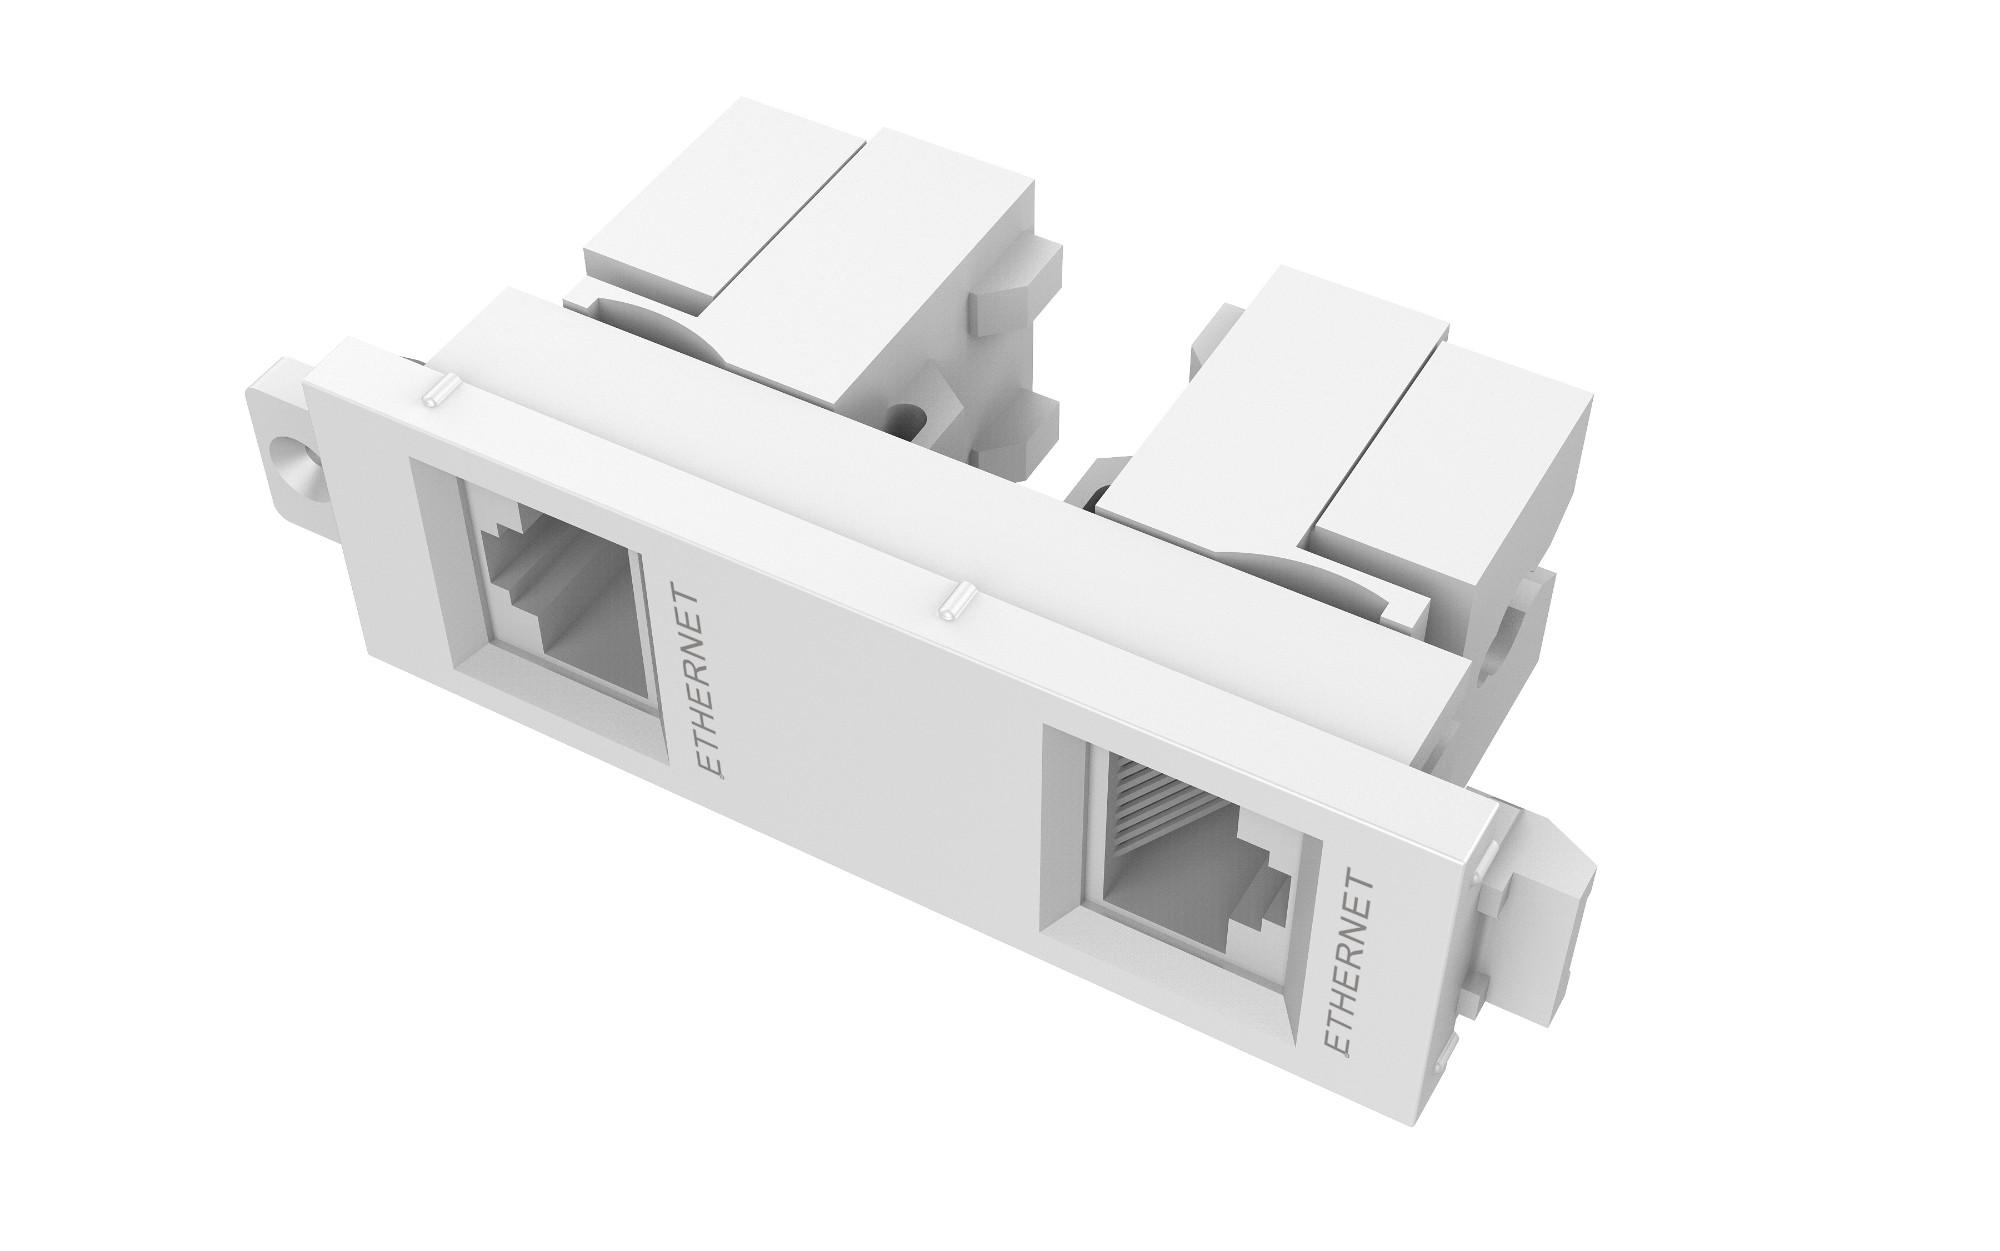 V3 Module Dual Rj45/rj11 Two Shielded Female To Female Ethernet Sockets